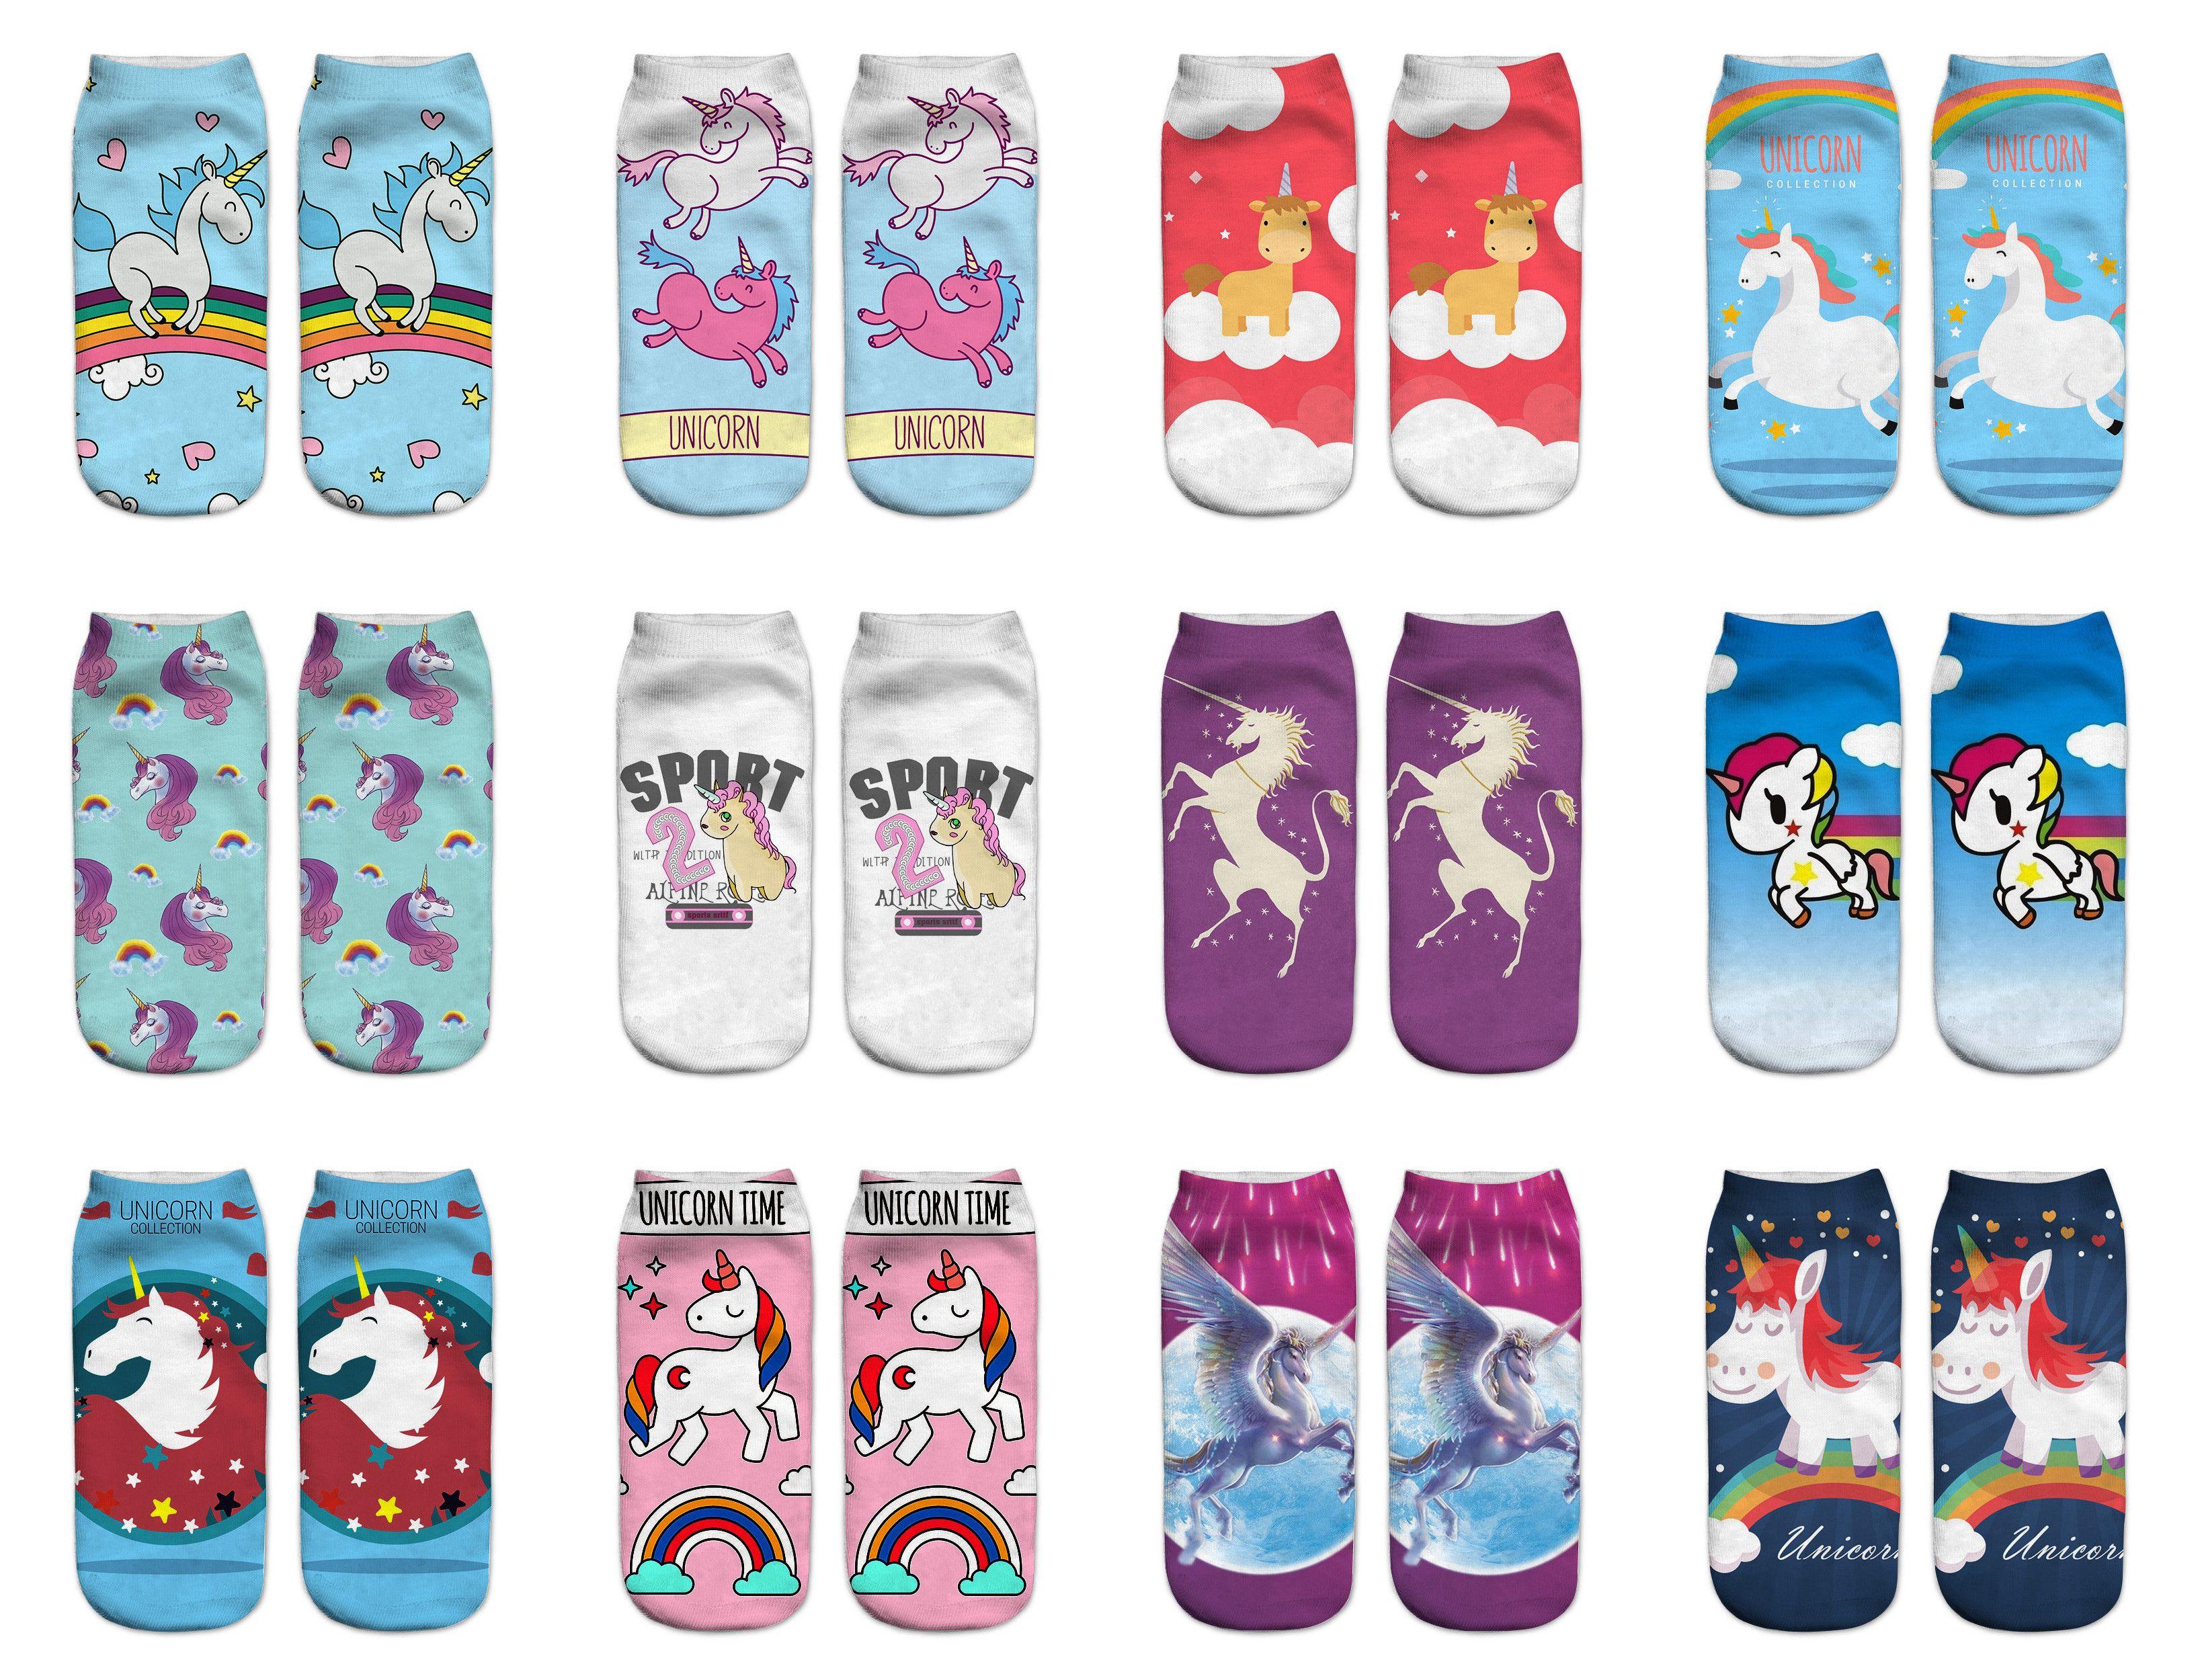 Thorlo socks discount coupons